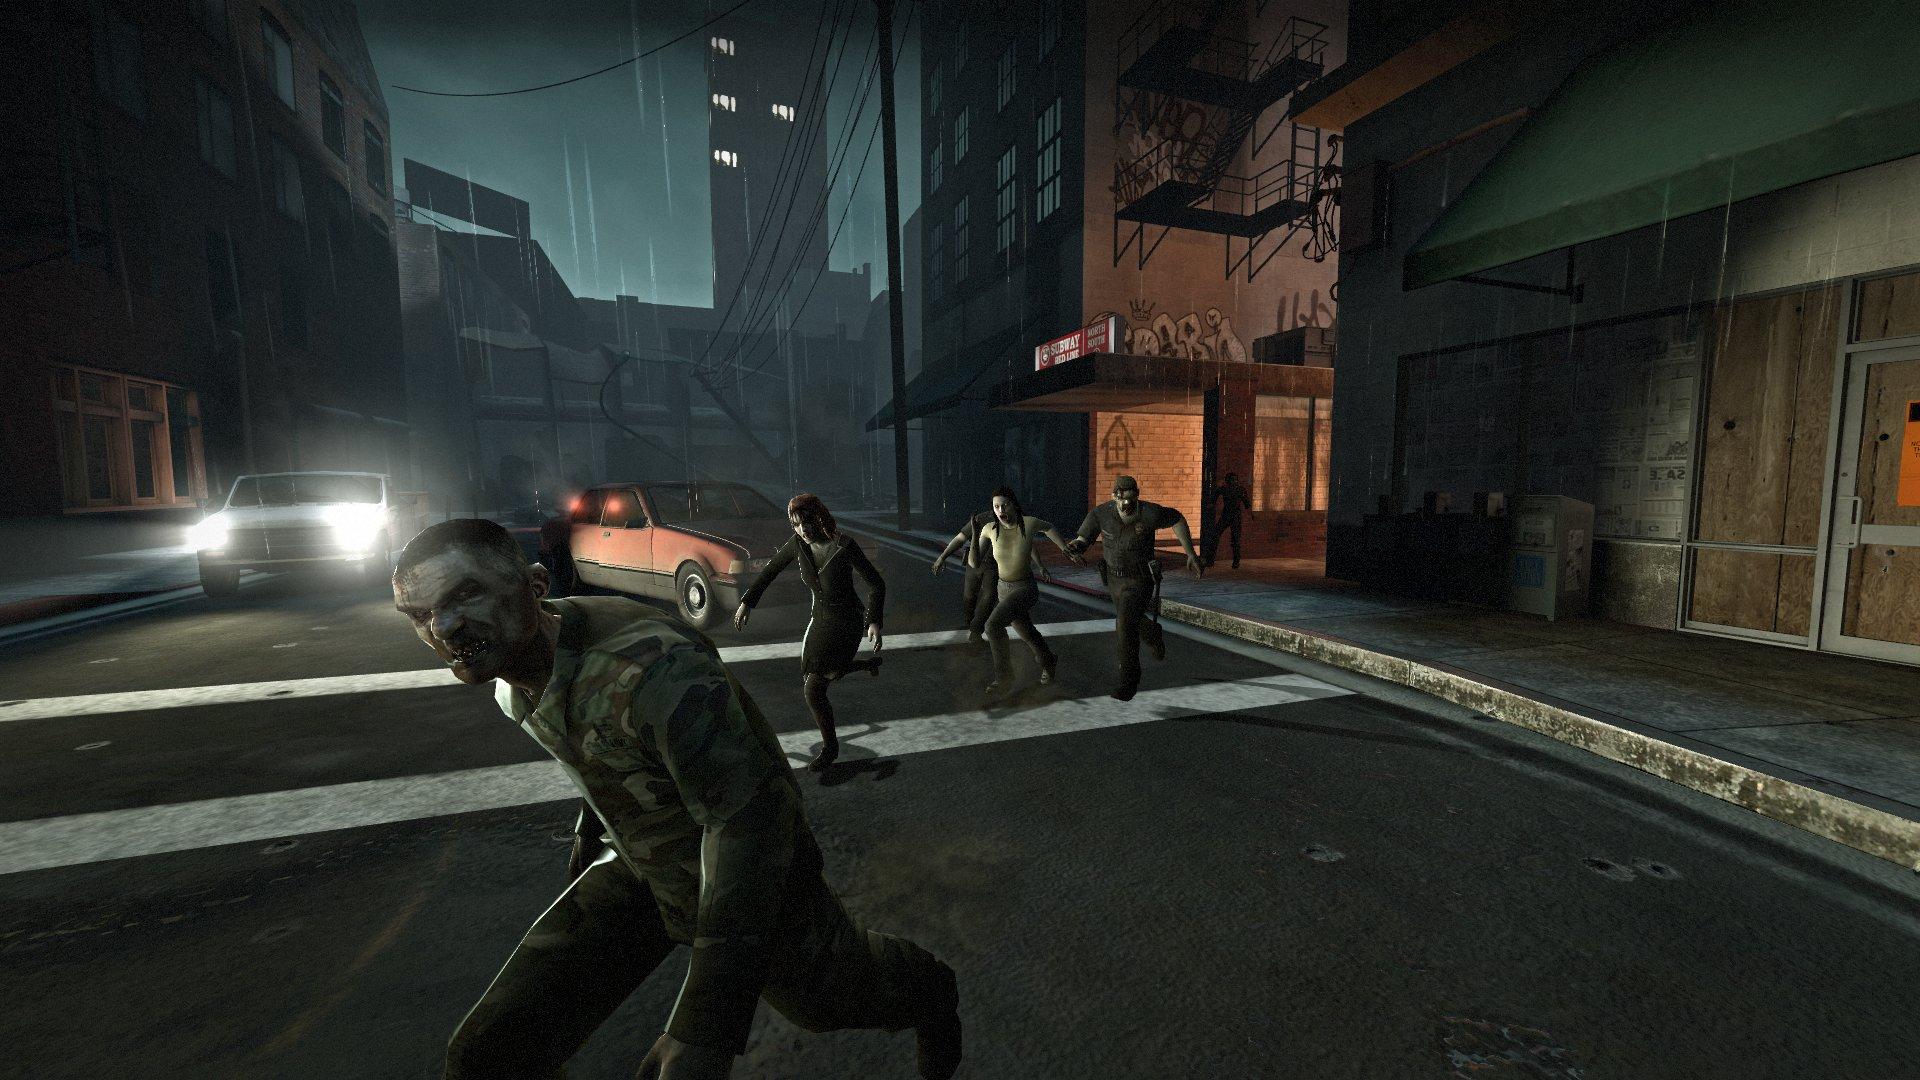 Left 4 Dead: The Sacrifice – Valve už zase koná zázraky 3321